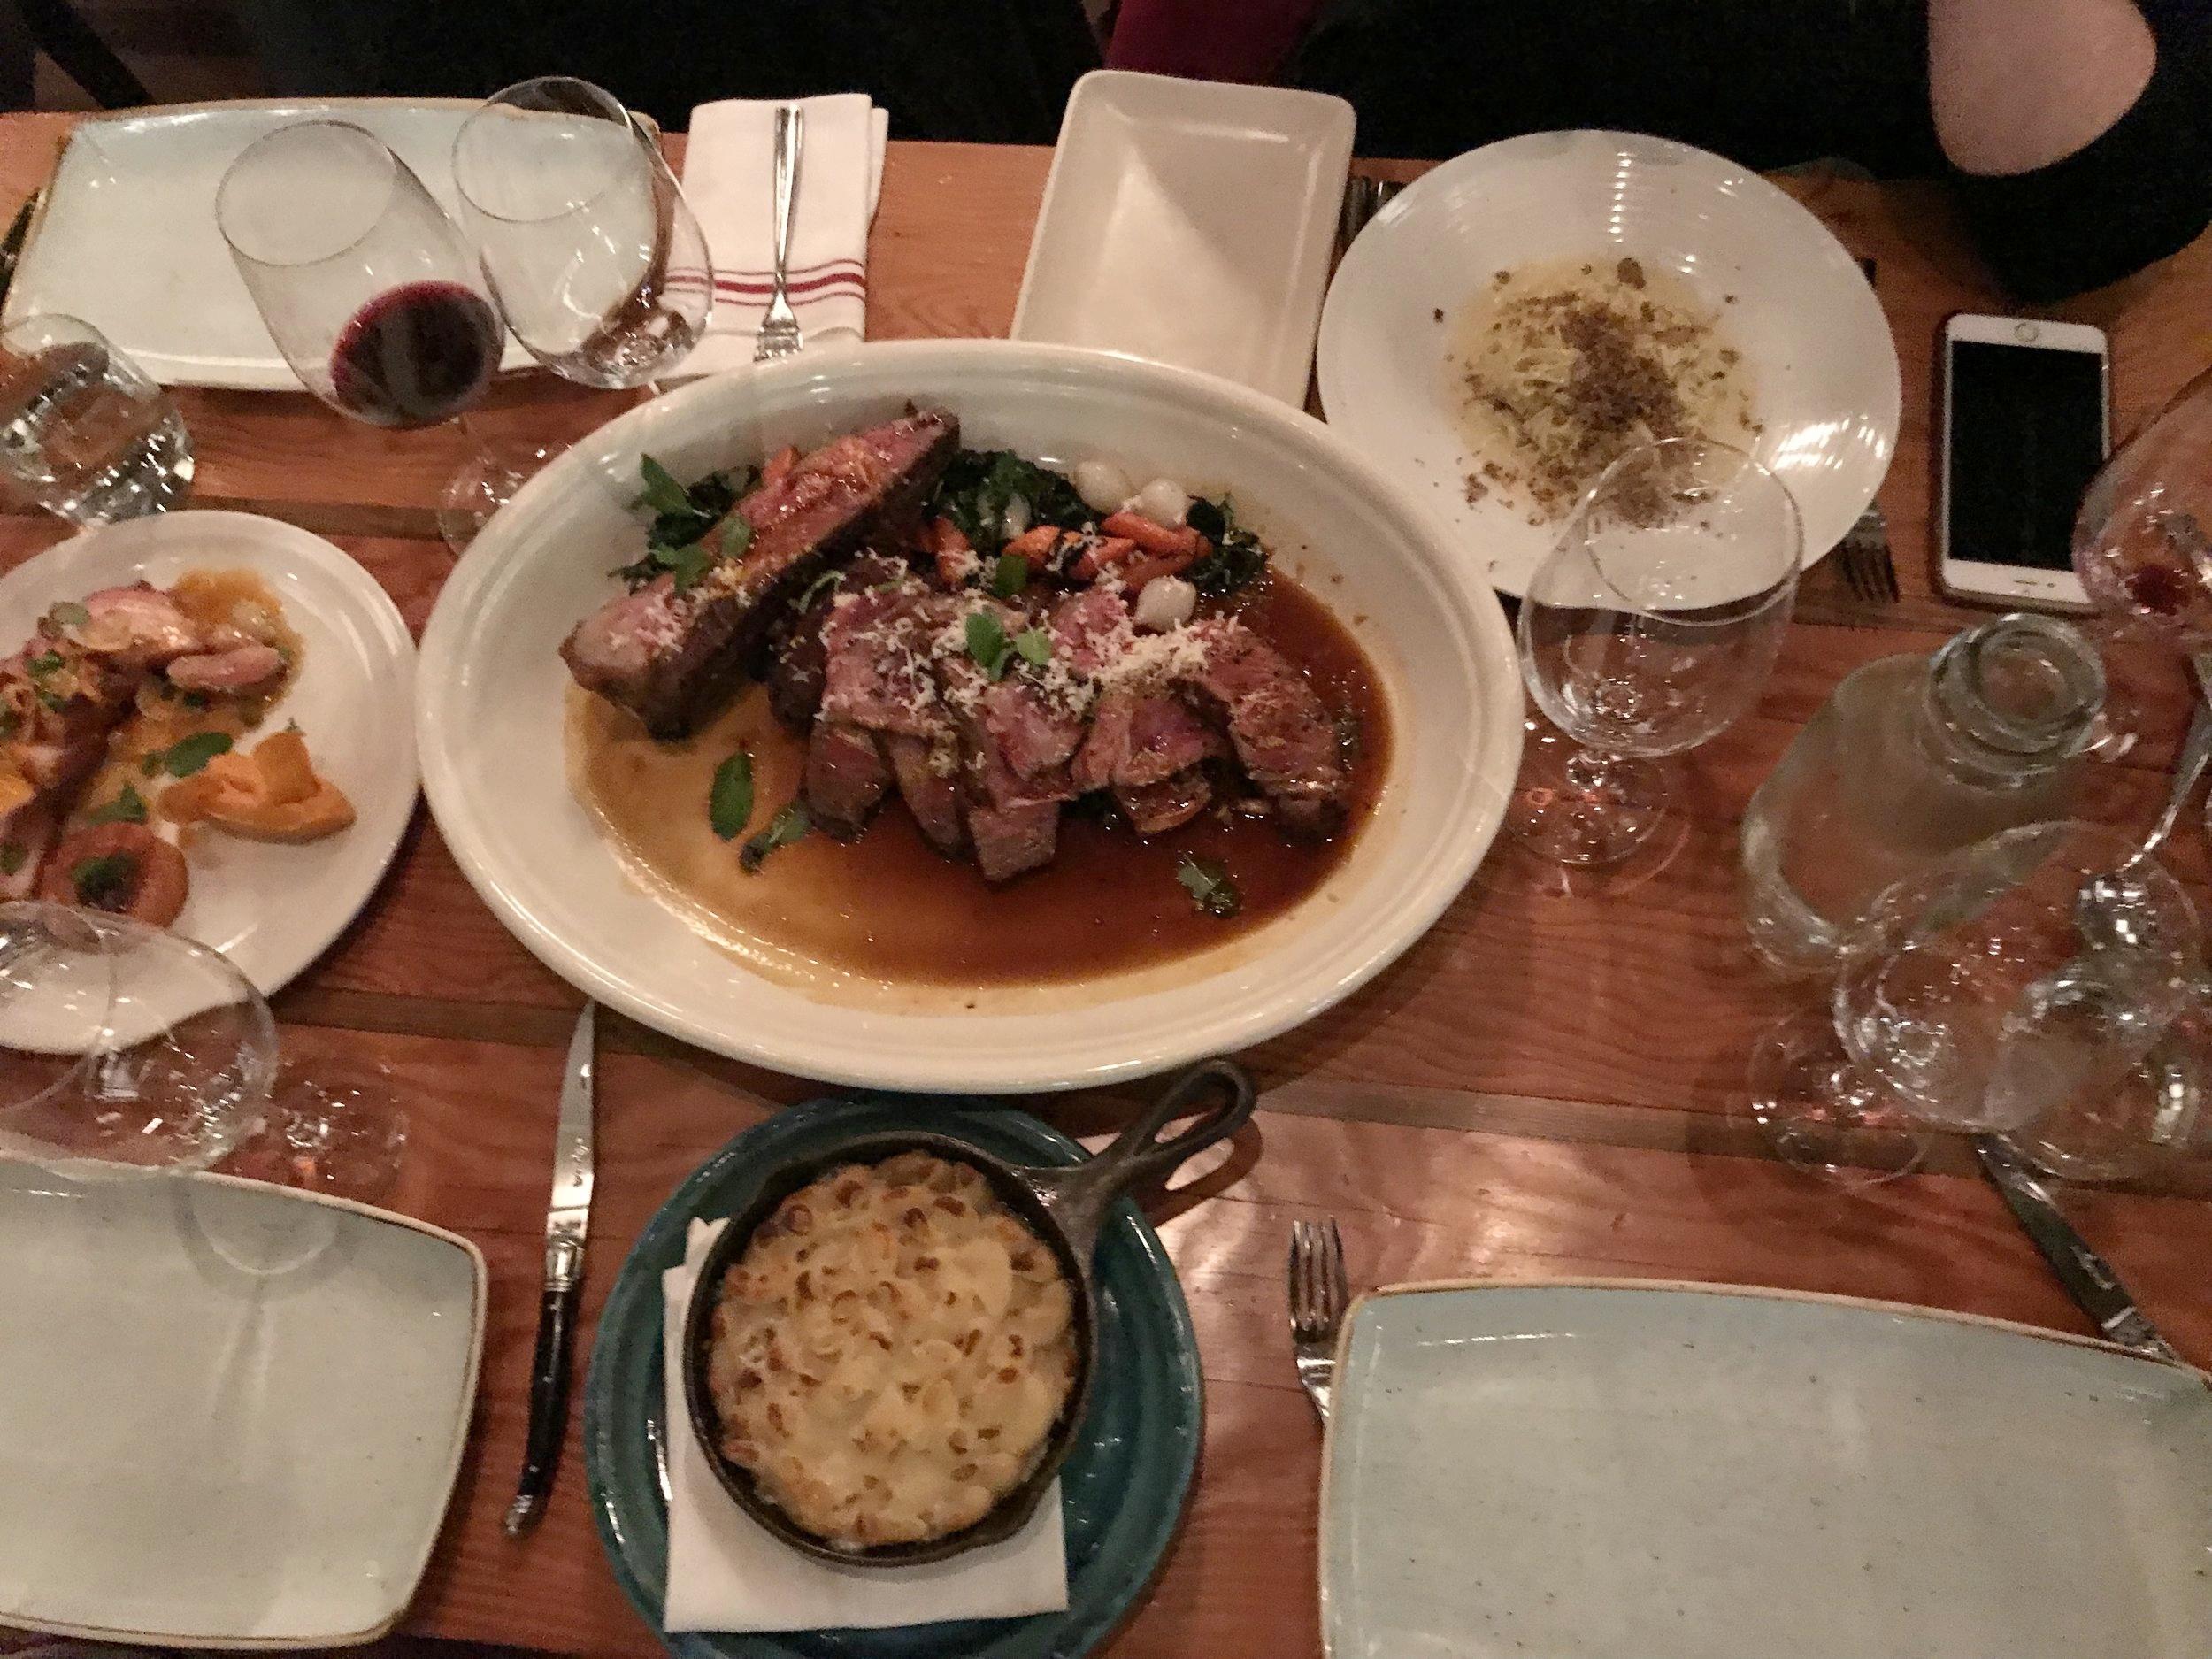 Torc Napa Dinner - Steak, Mac n Cheese, pork